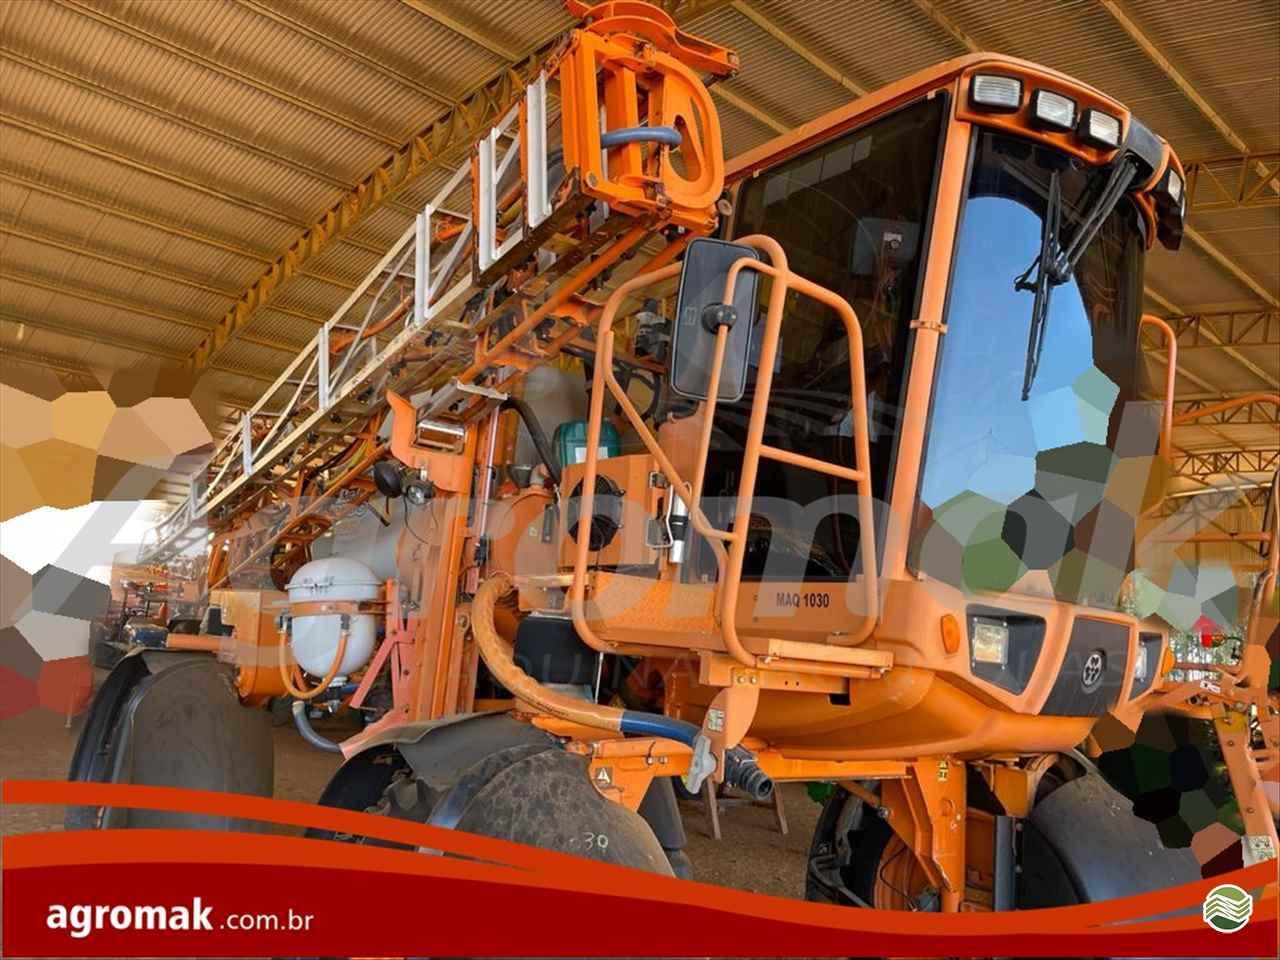 UNIPORT 2500 STAR de Agromak Máquinas Agrícolas - CAMPO VERDE/MT